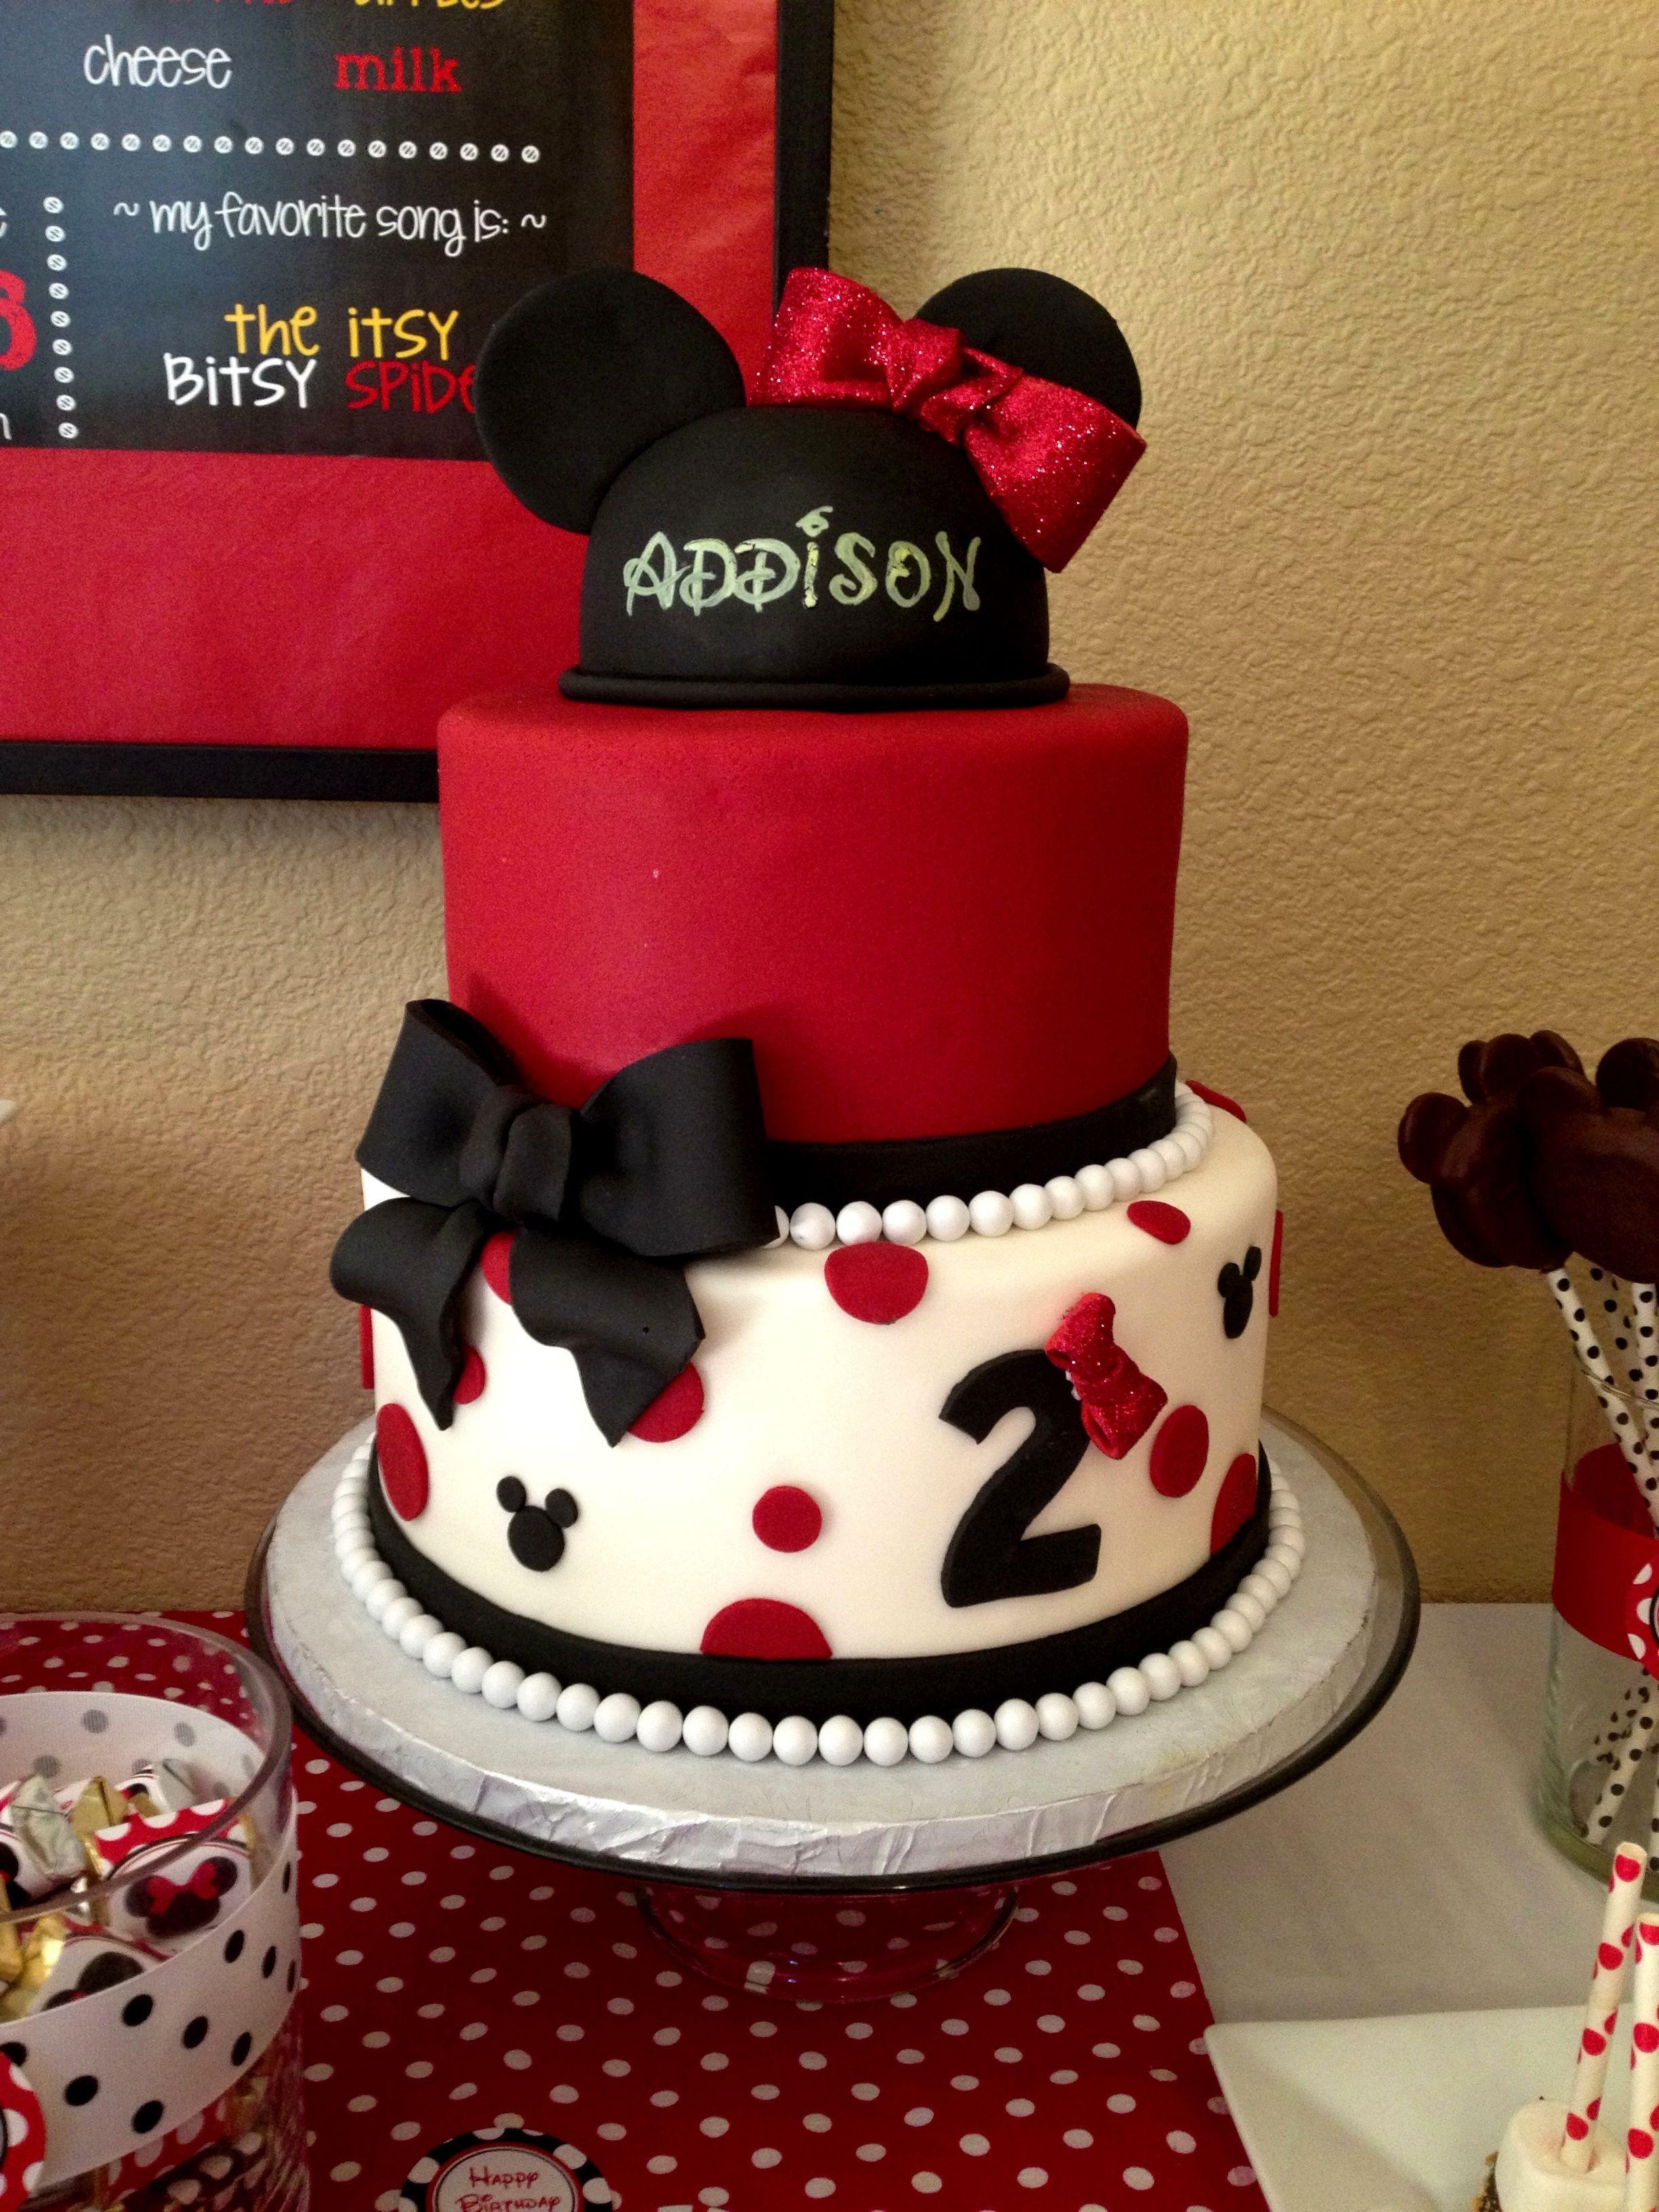 Disney Themed Cakes | Disney themed cakes, Mickey cakes, Mouse cake